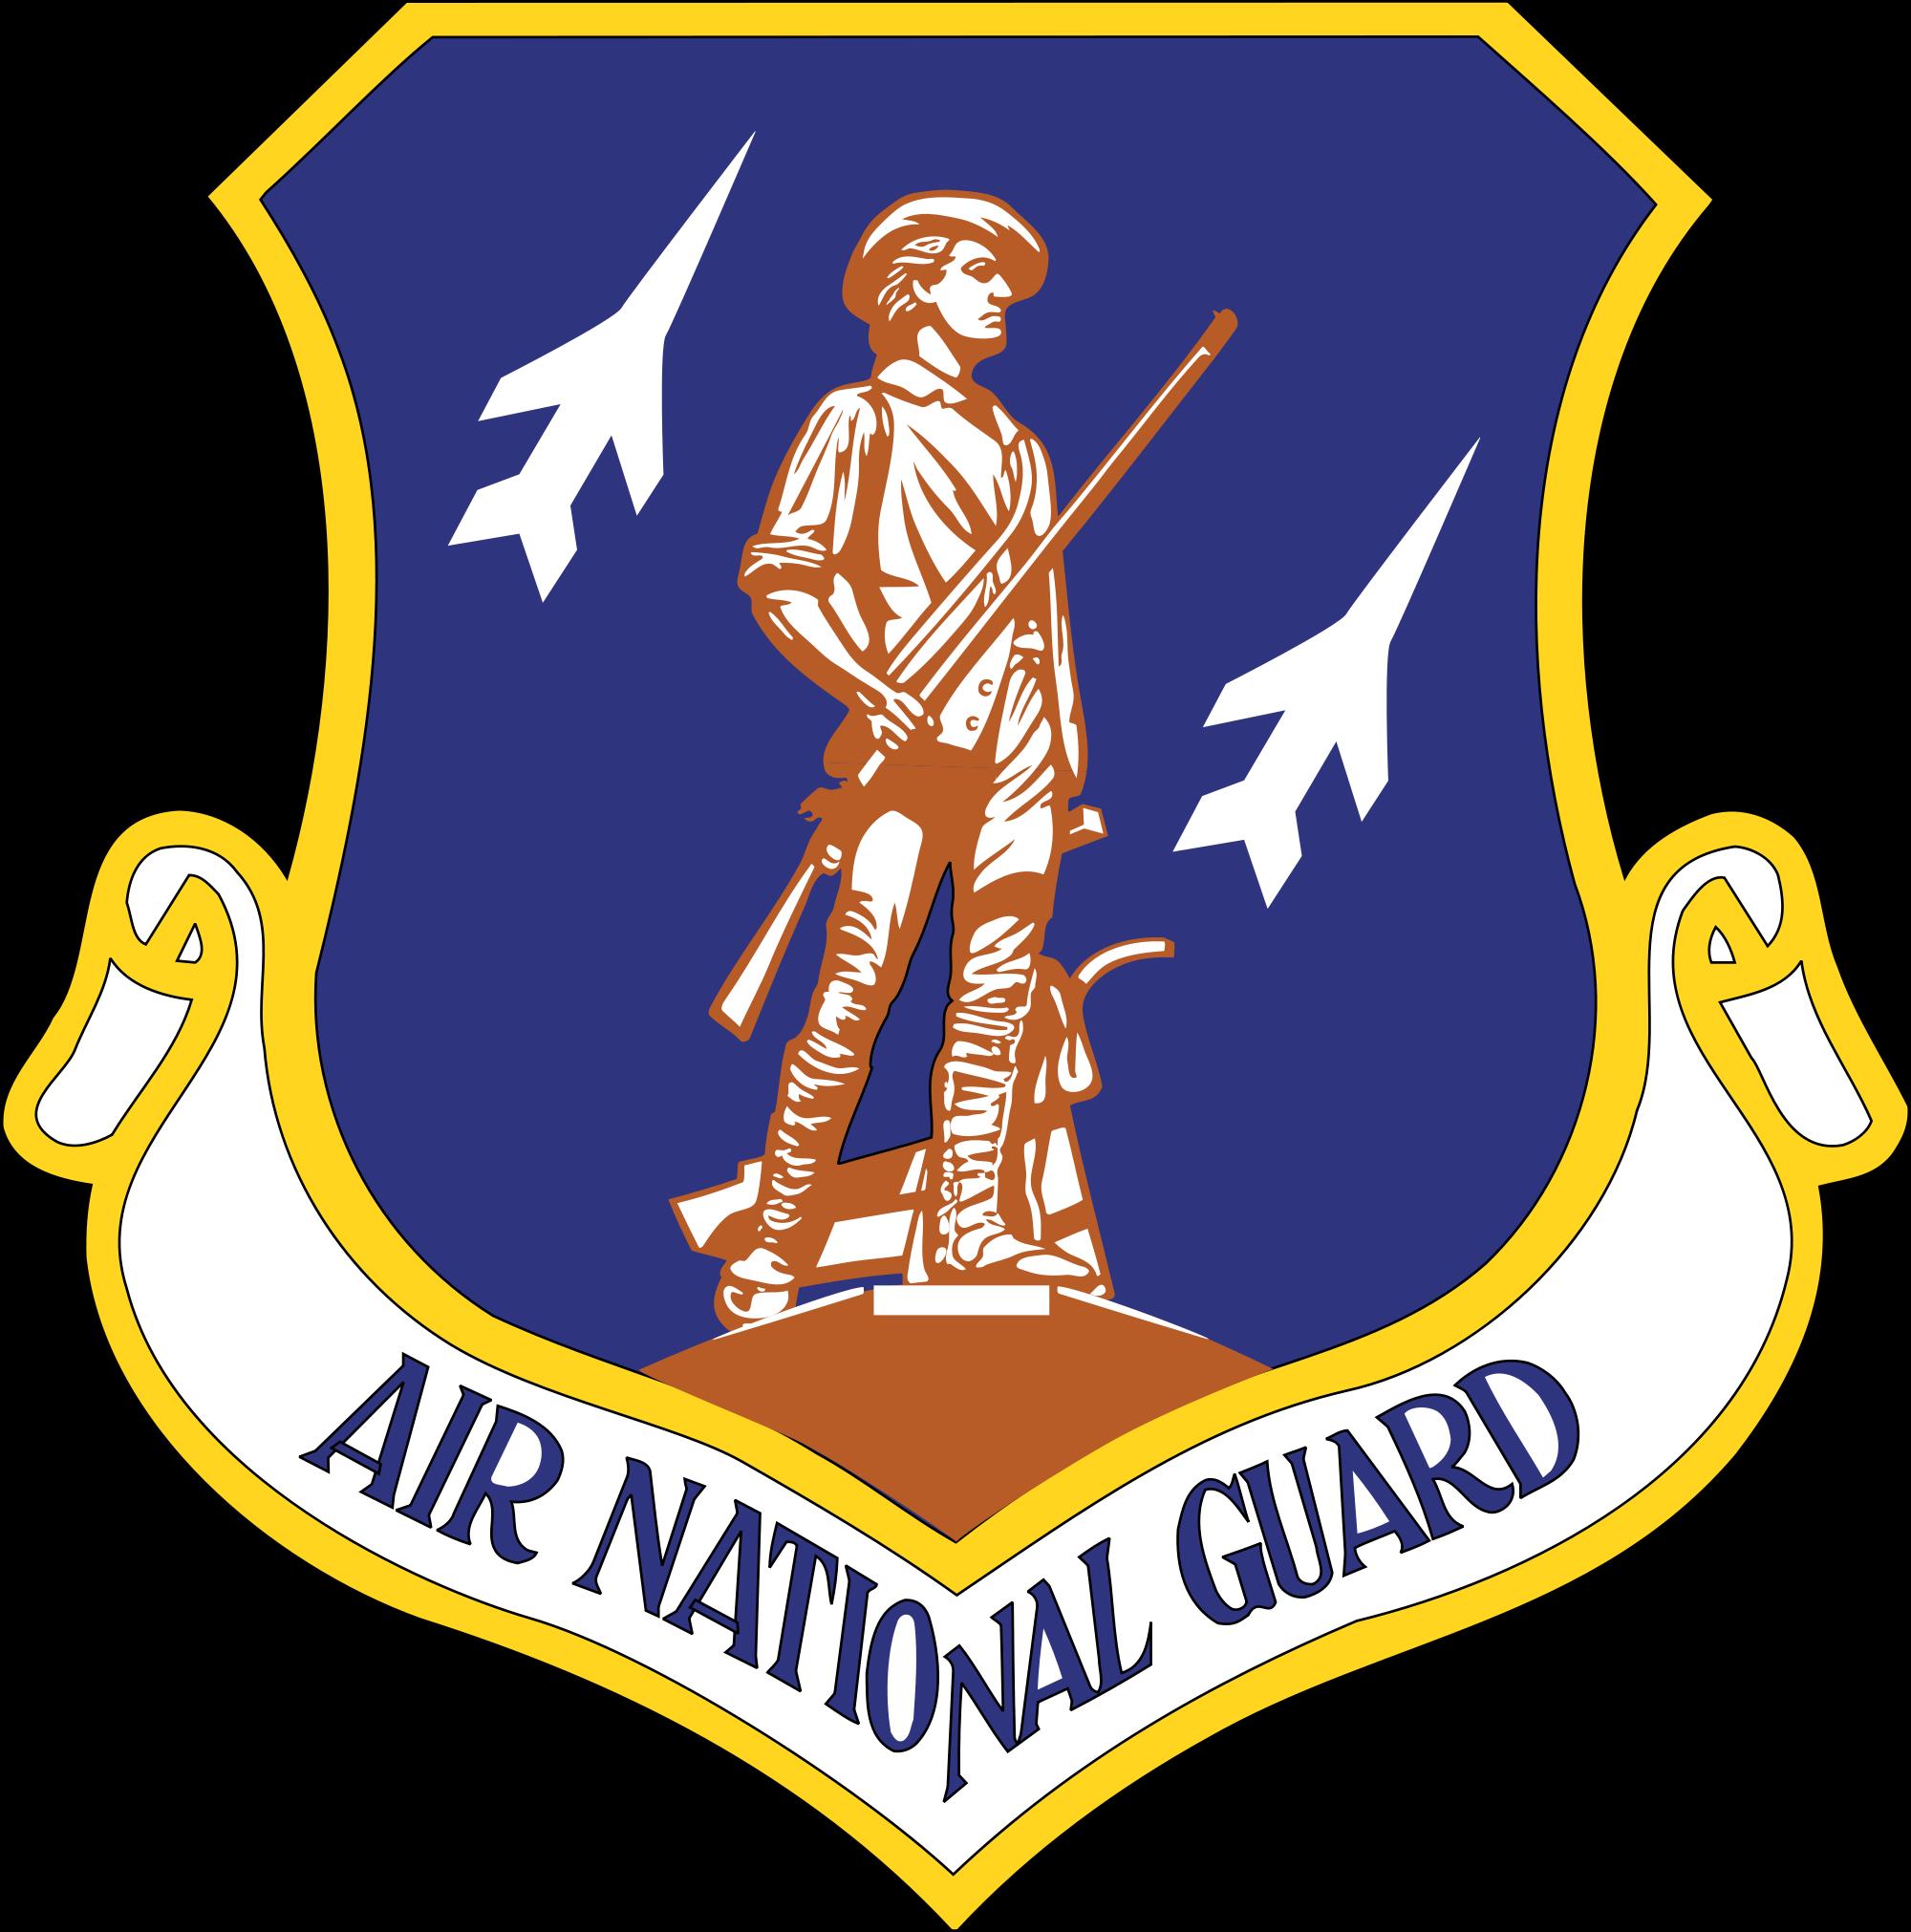 US-AirNationalGuard-2007Emblem.svg